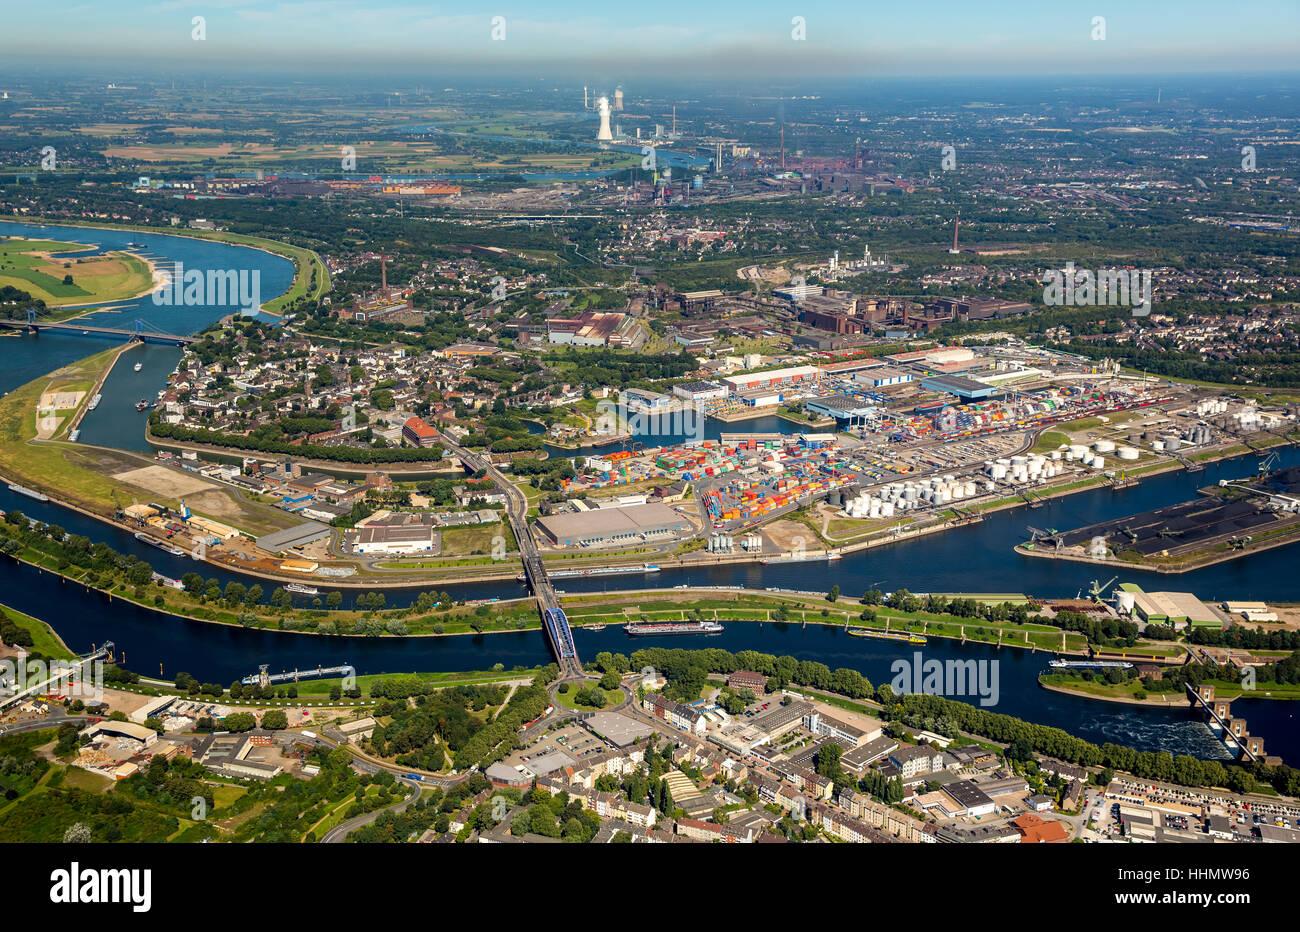 Duisport, inland port, Rhine, Duisburg, Ruhr district, North Rhine-Westphalia, Germany - Stock Image